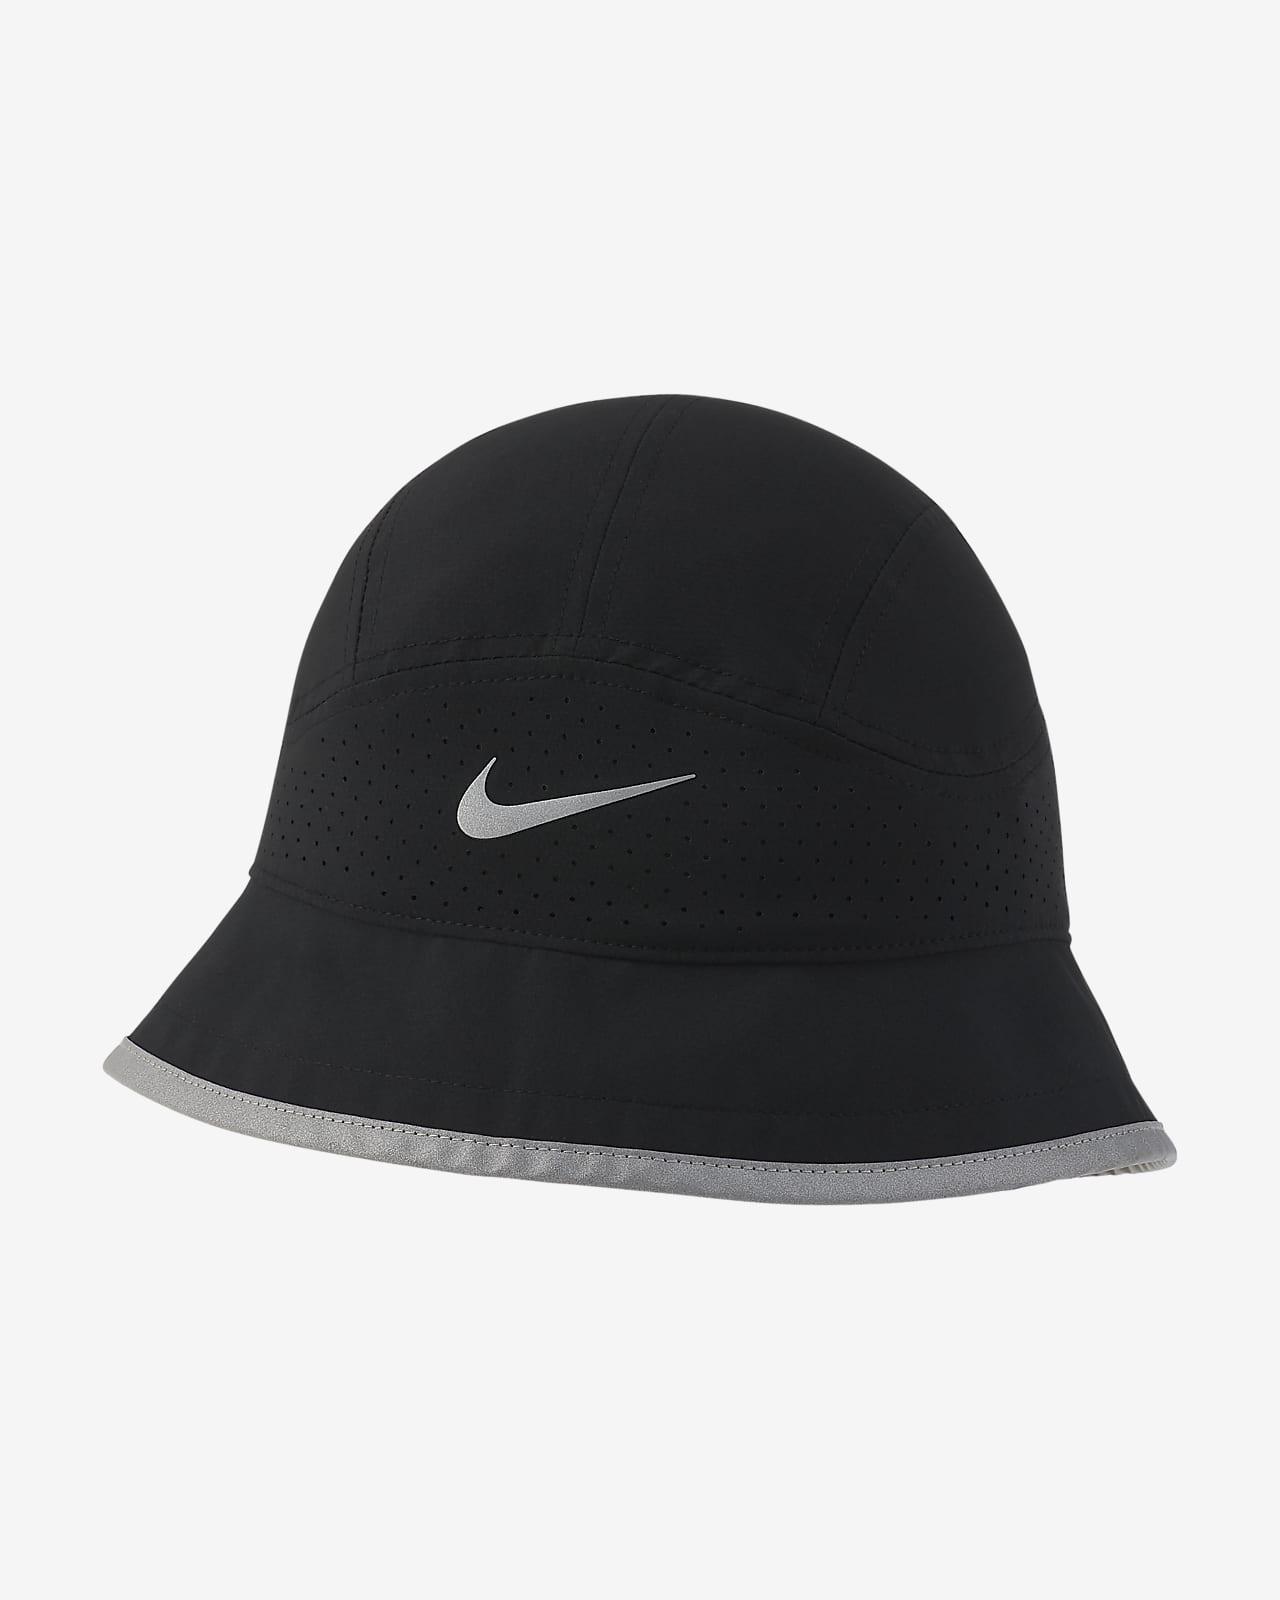 Перфорированная панама для бега Nike Dri-FIT